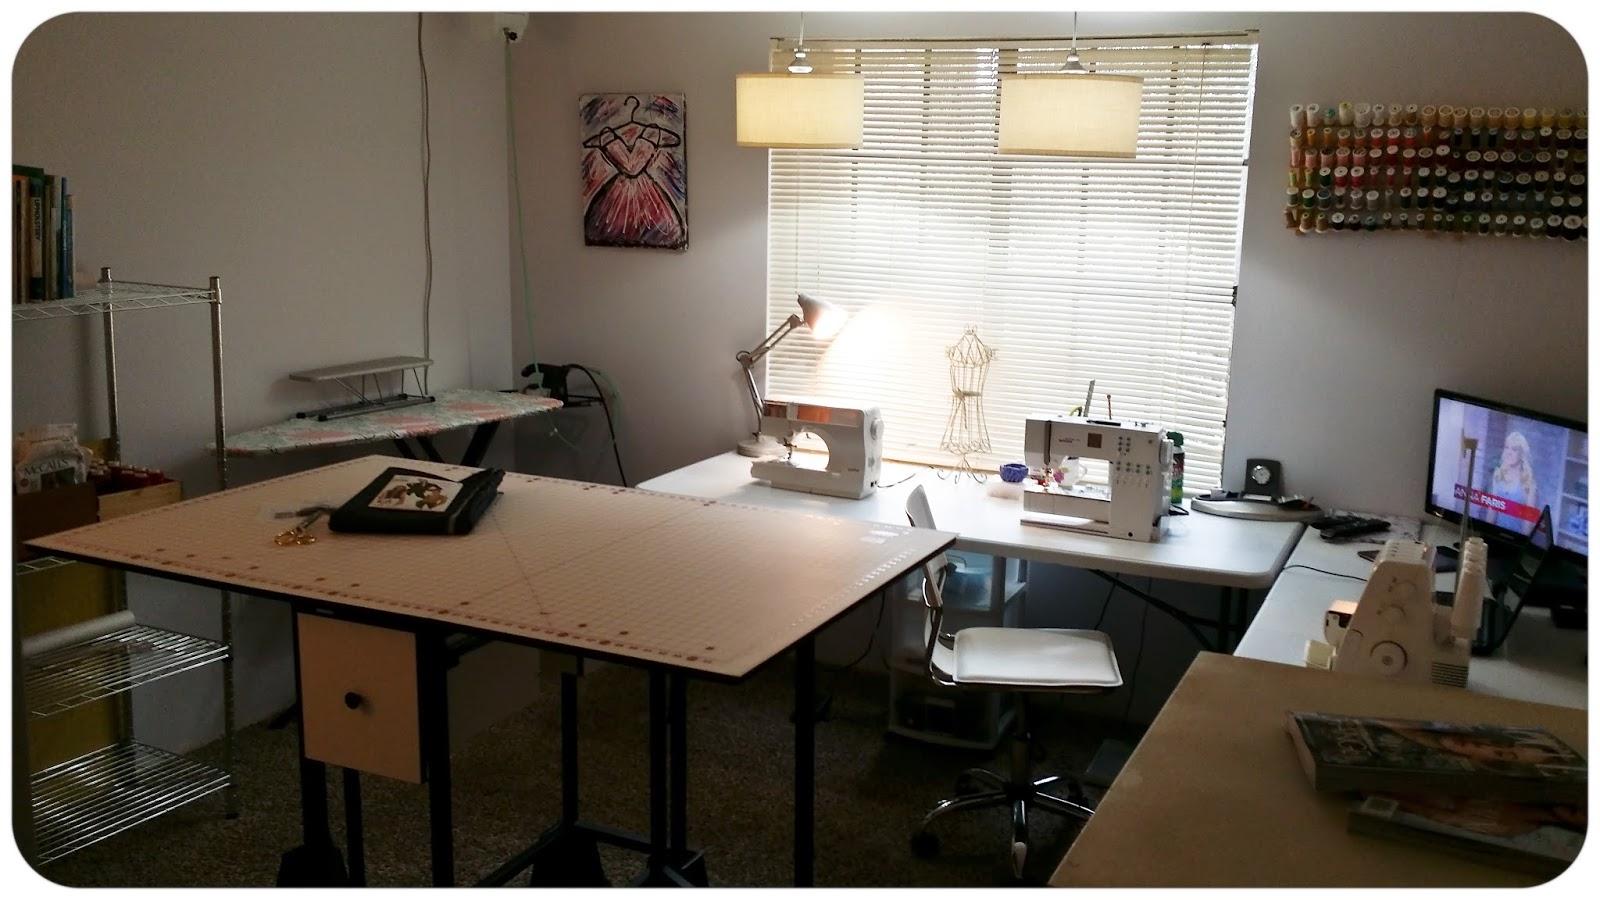 Erica Bunkeru0027s Sewing Studio